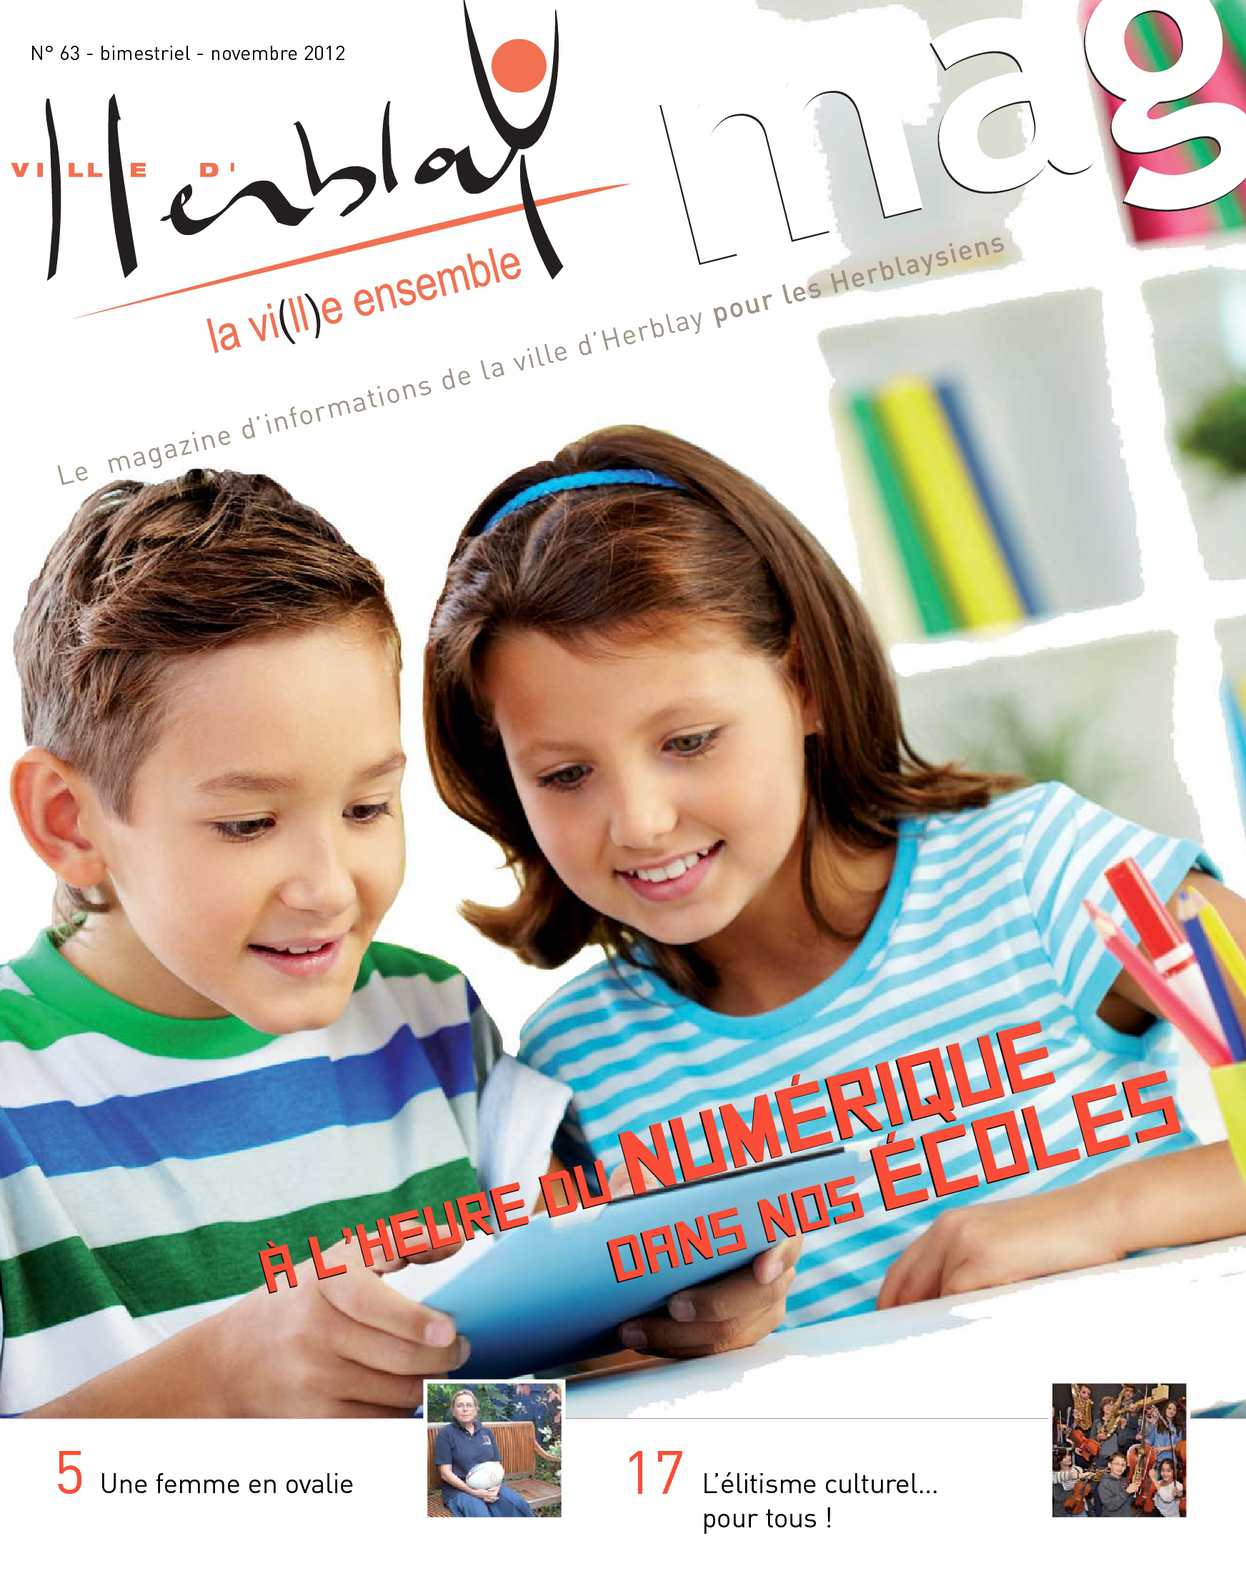 Calam o herblay mag n 63 novembre 2012 - Piscine d herblay ...